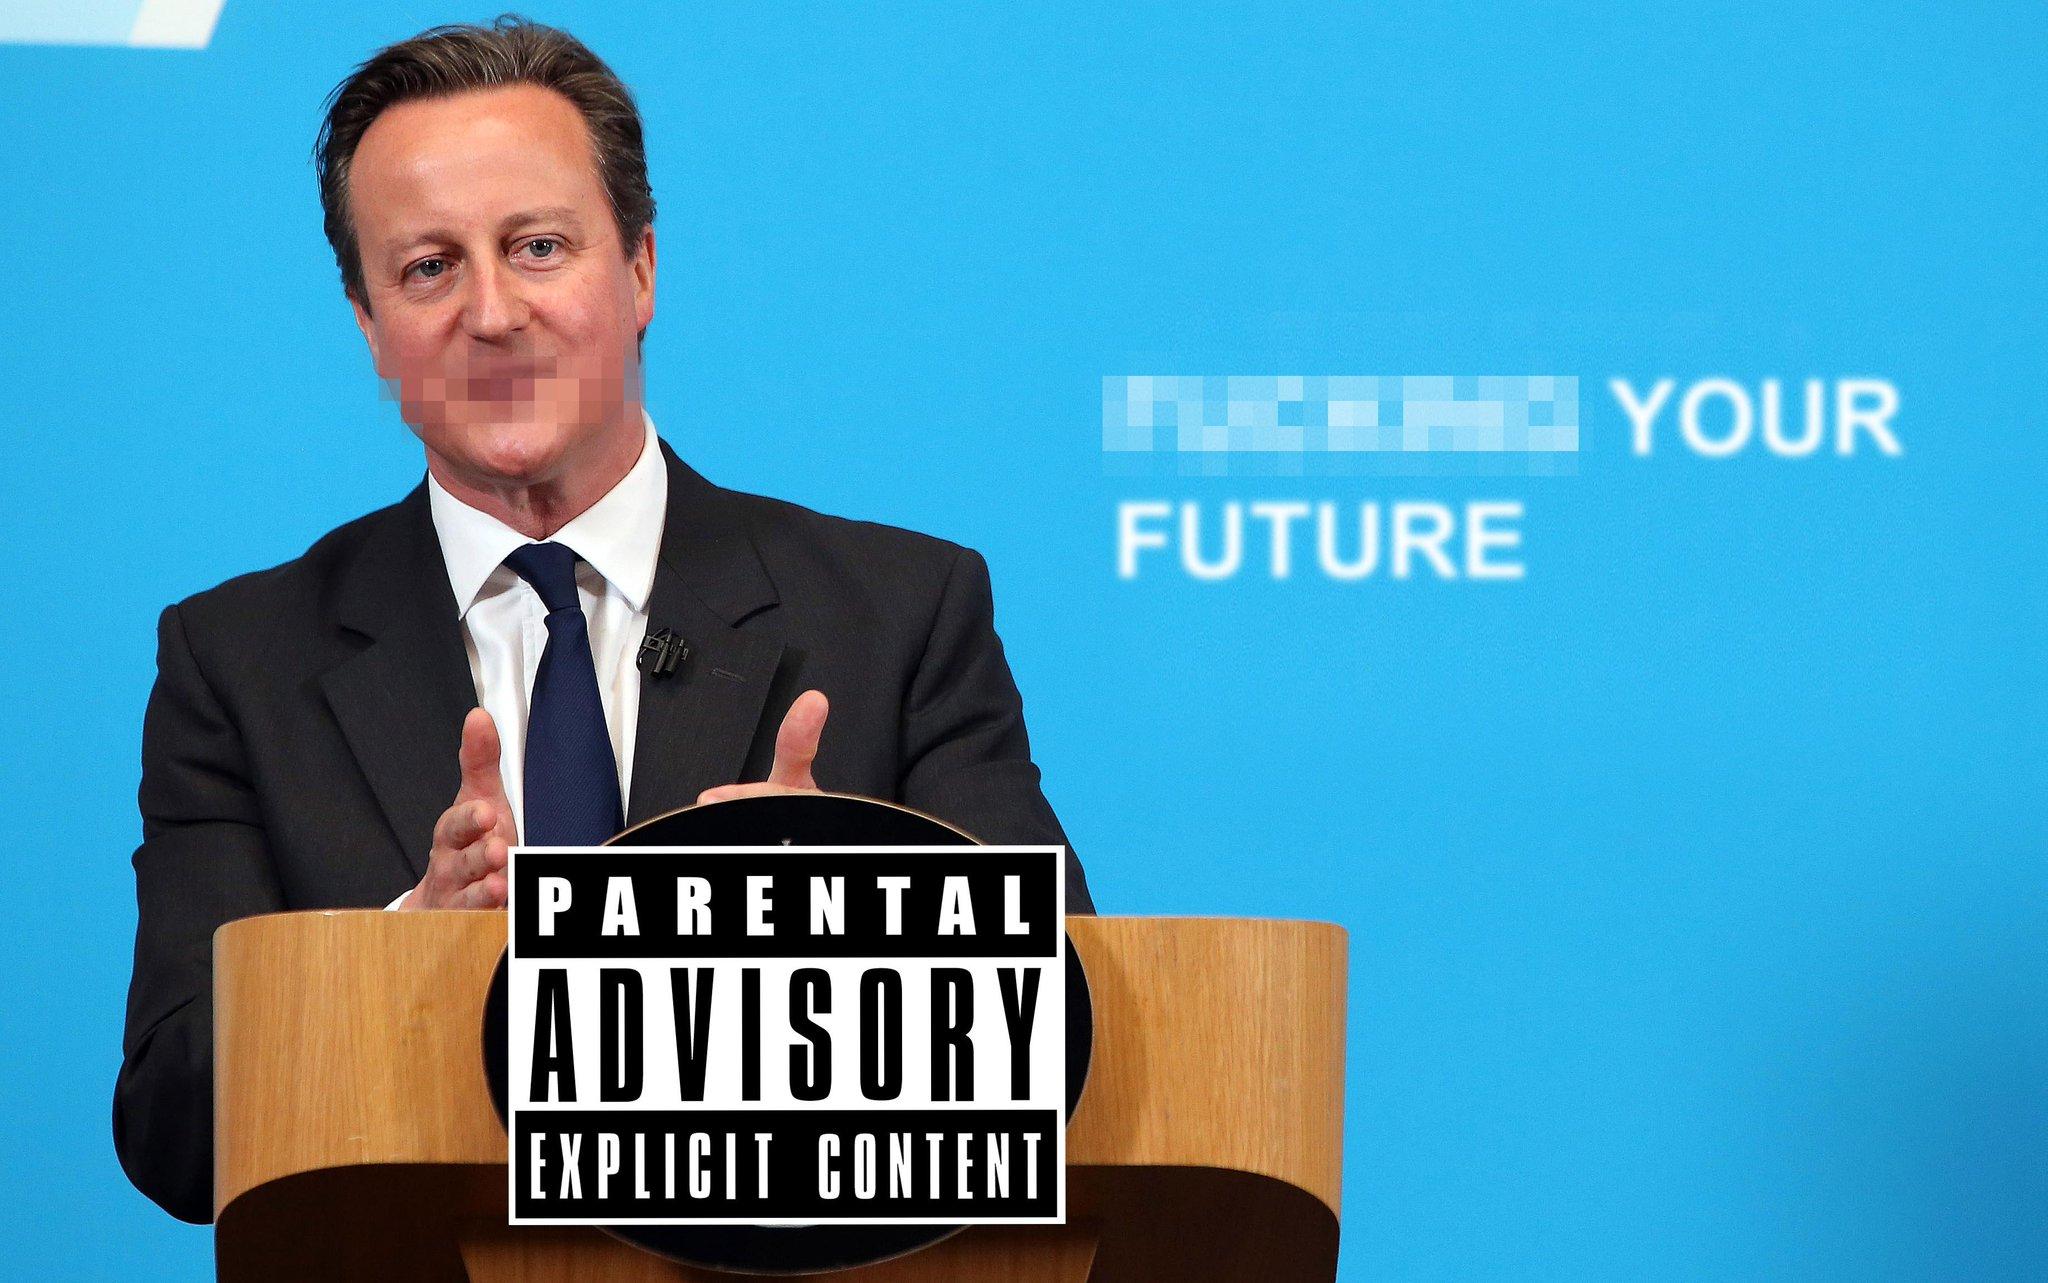 David Cameron: the censored version. (done for @HuffPostUKCom) http://t.co/mpXkCnImXX http://t.co/M9nw0dZHKY